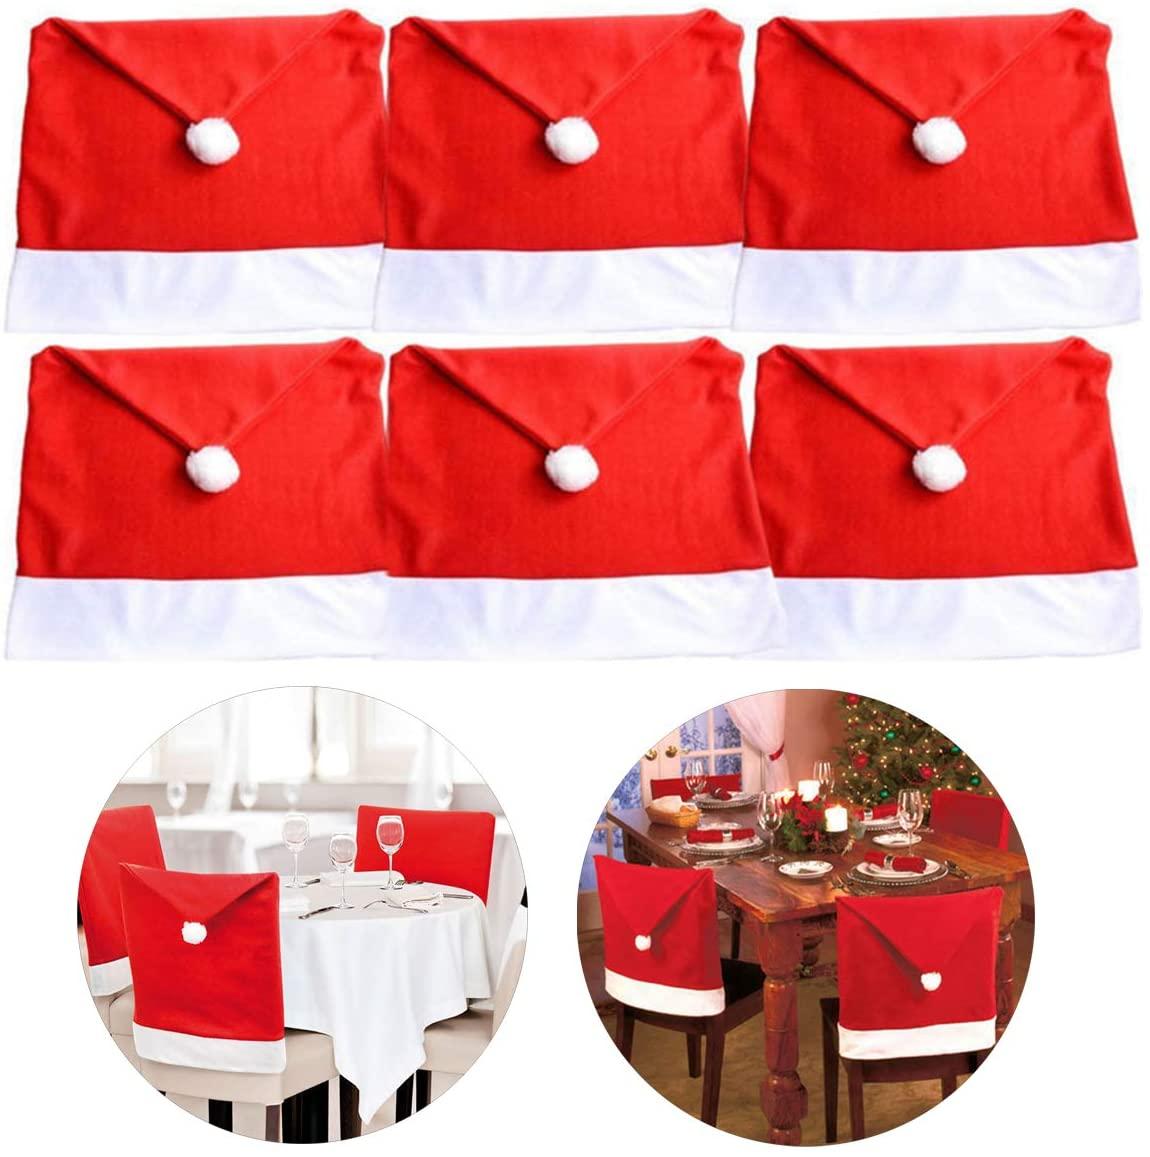 StyleZ 6PCS Santa Hat Chair Covers Chair Back Decoration Christmas Festive Home Dinner Table Kitchen Party Decor